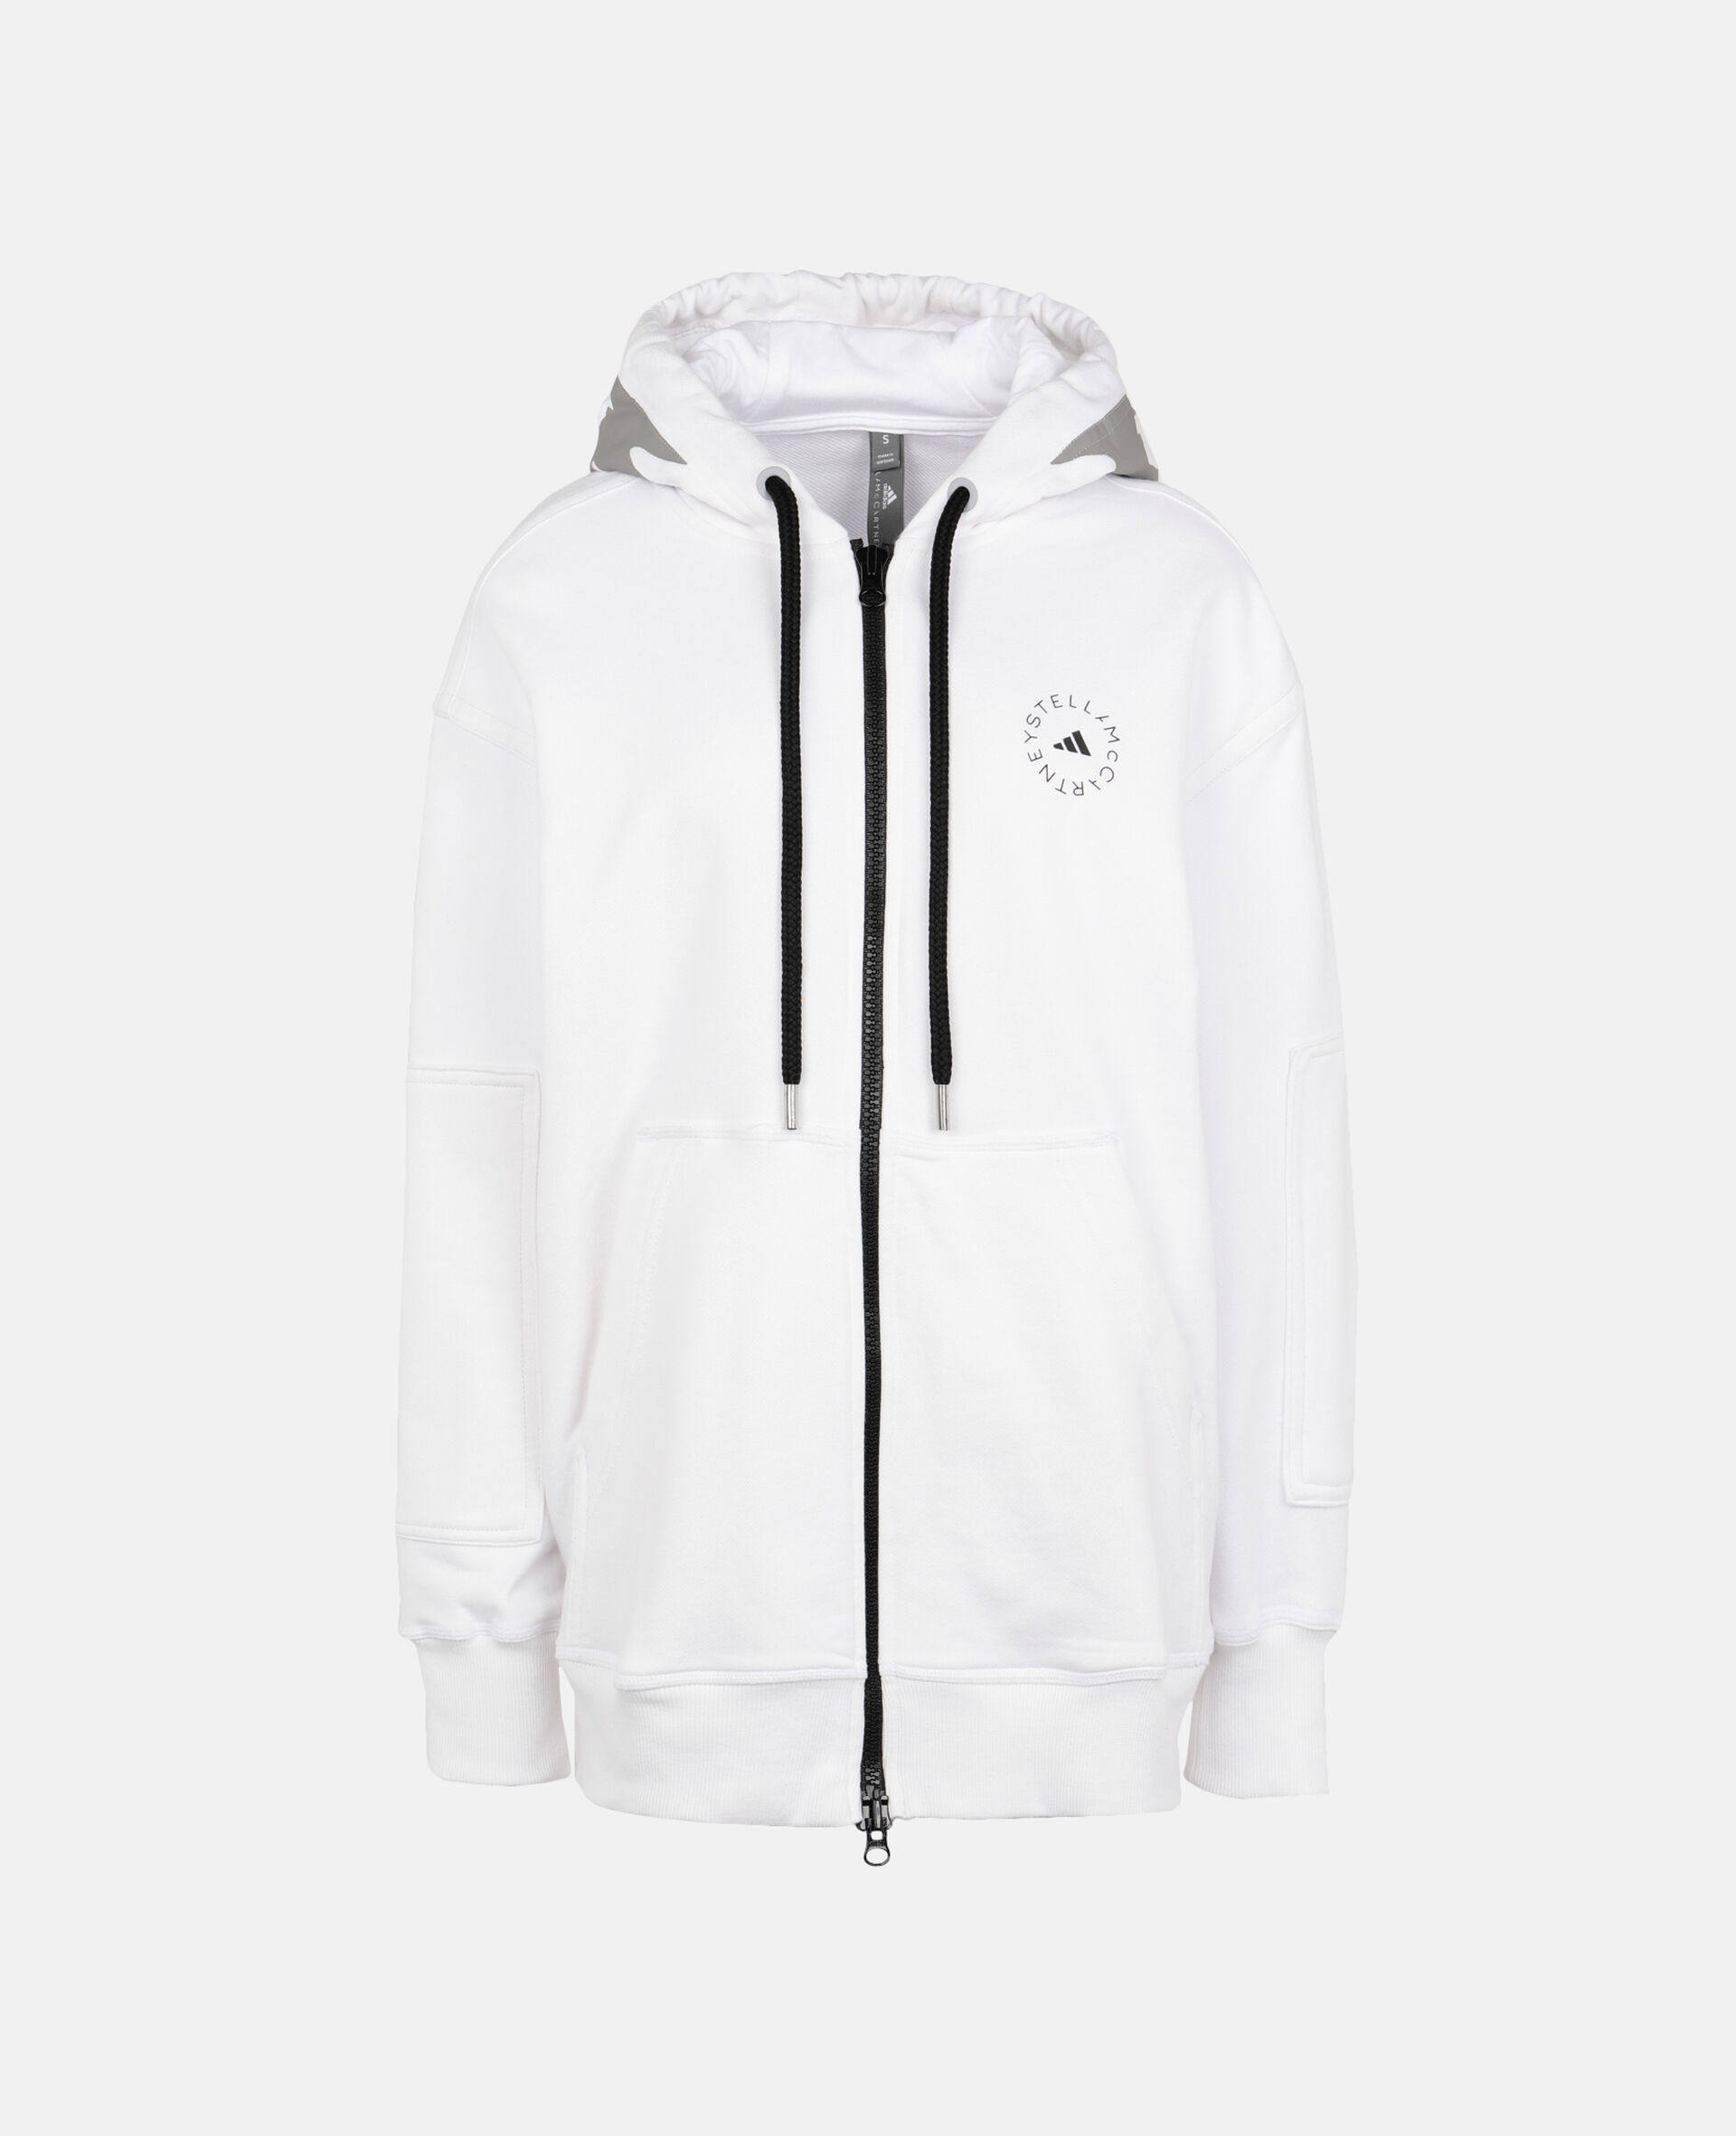 White Full-zipper Hoodie-White-large image number 0